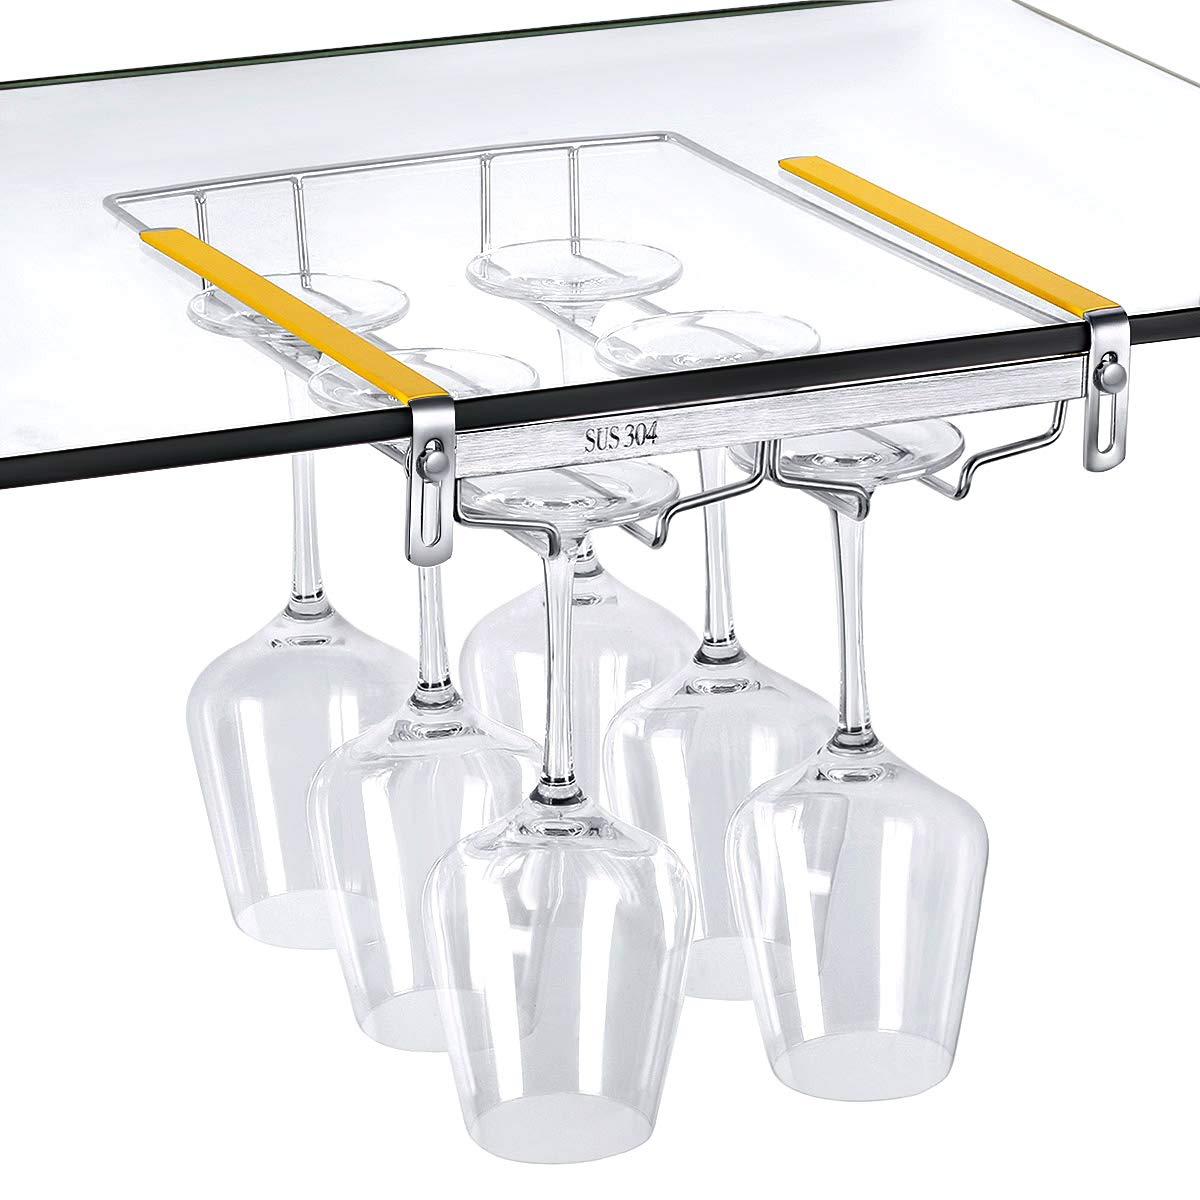 VOBAGA Stemware Racks 2 or 3 Rows Adjustable Stainless Steel Wine Glass Rack Stemware Hanger Bar Home Cup Glass Holder Dinnerware Kitchen Dining LL029-2